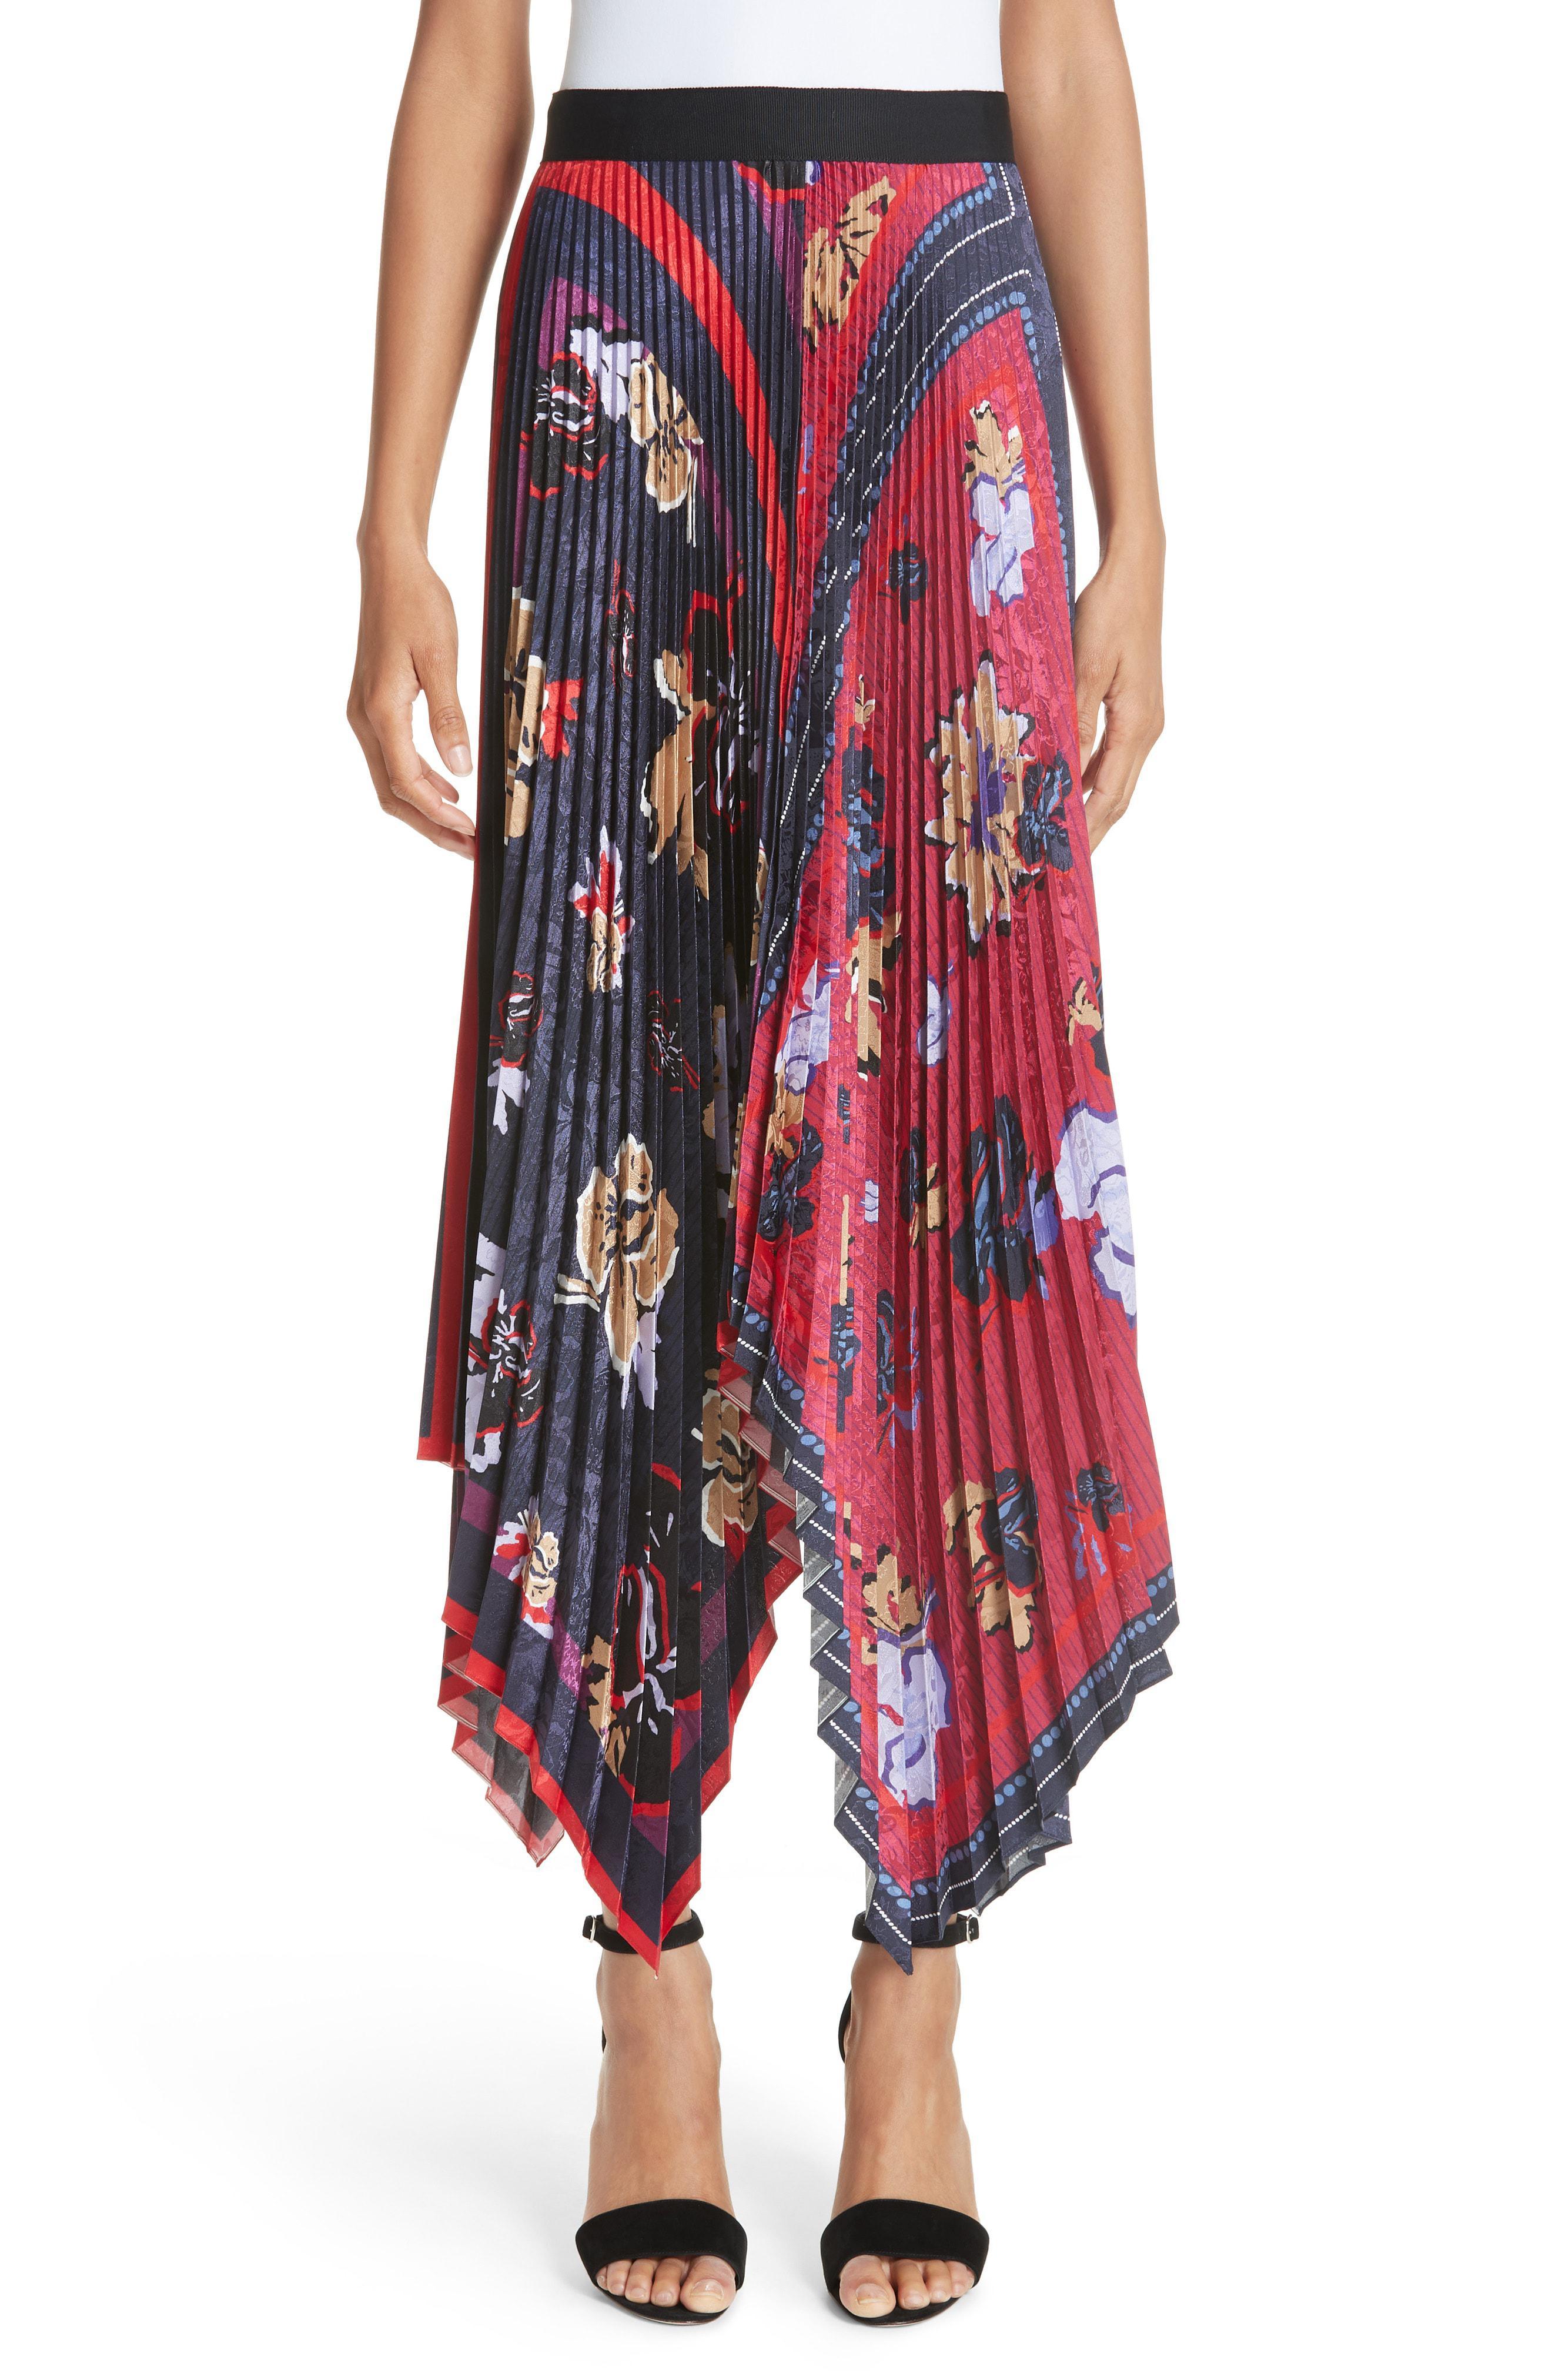 76d718c61 Yigal Azrouël Women's Pleated Handkerchief Midi Skirt - Midnight ...